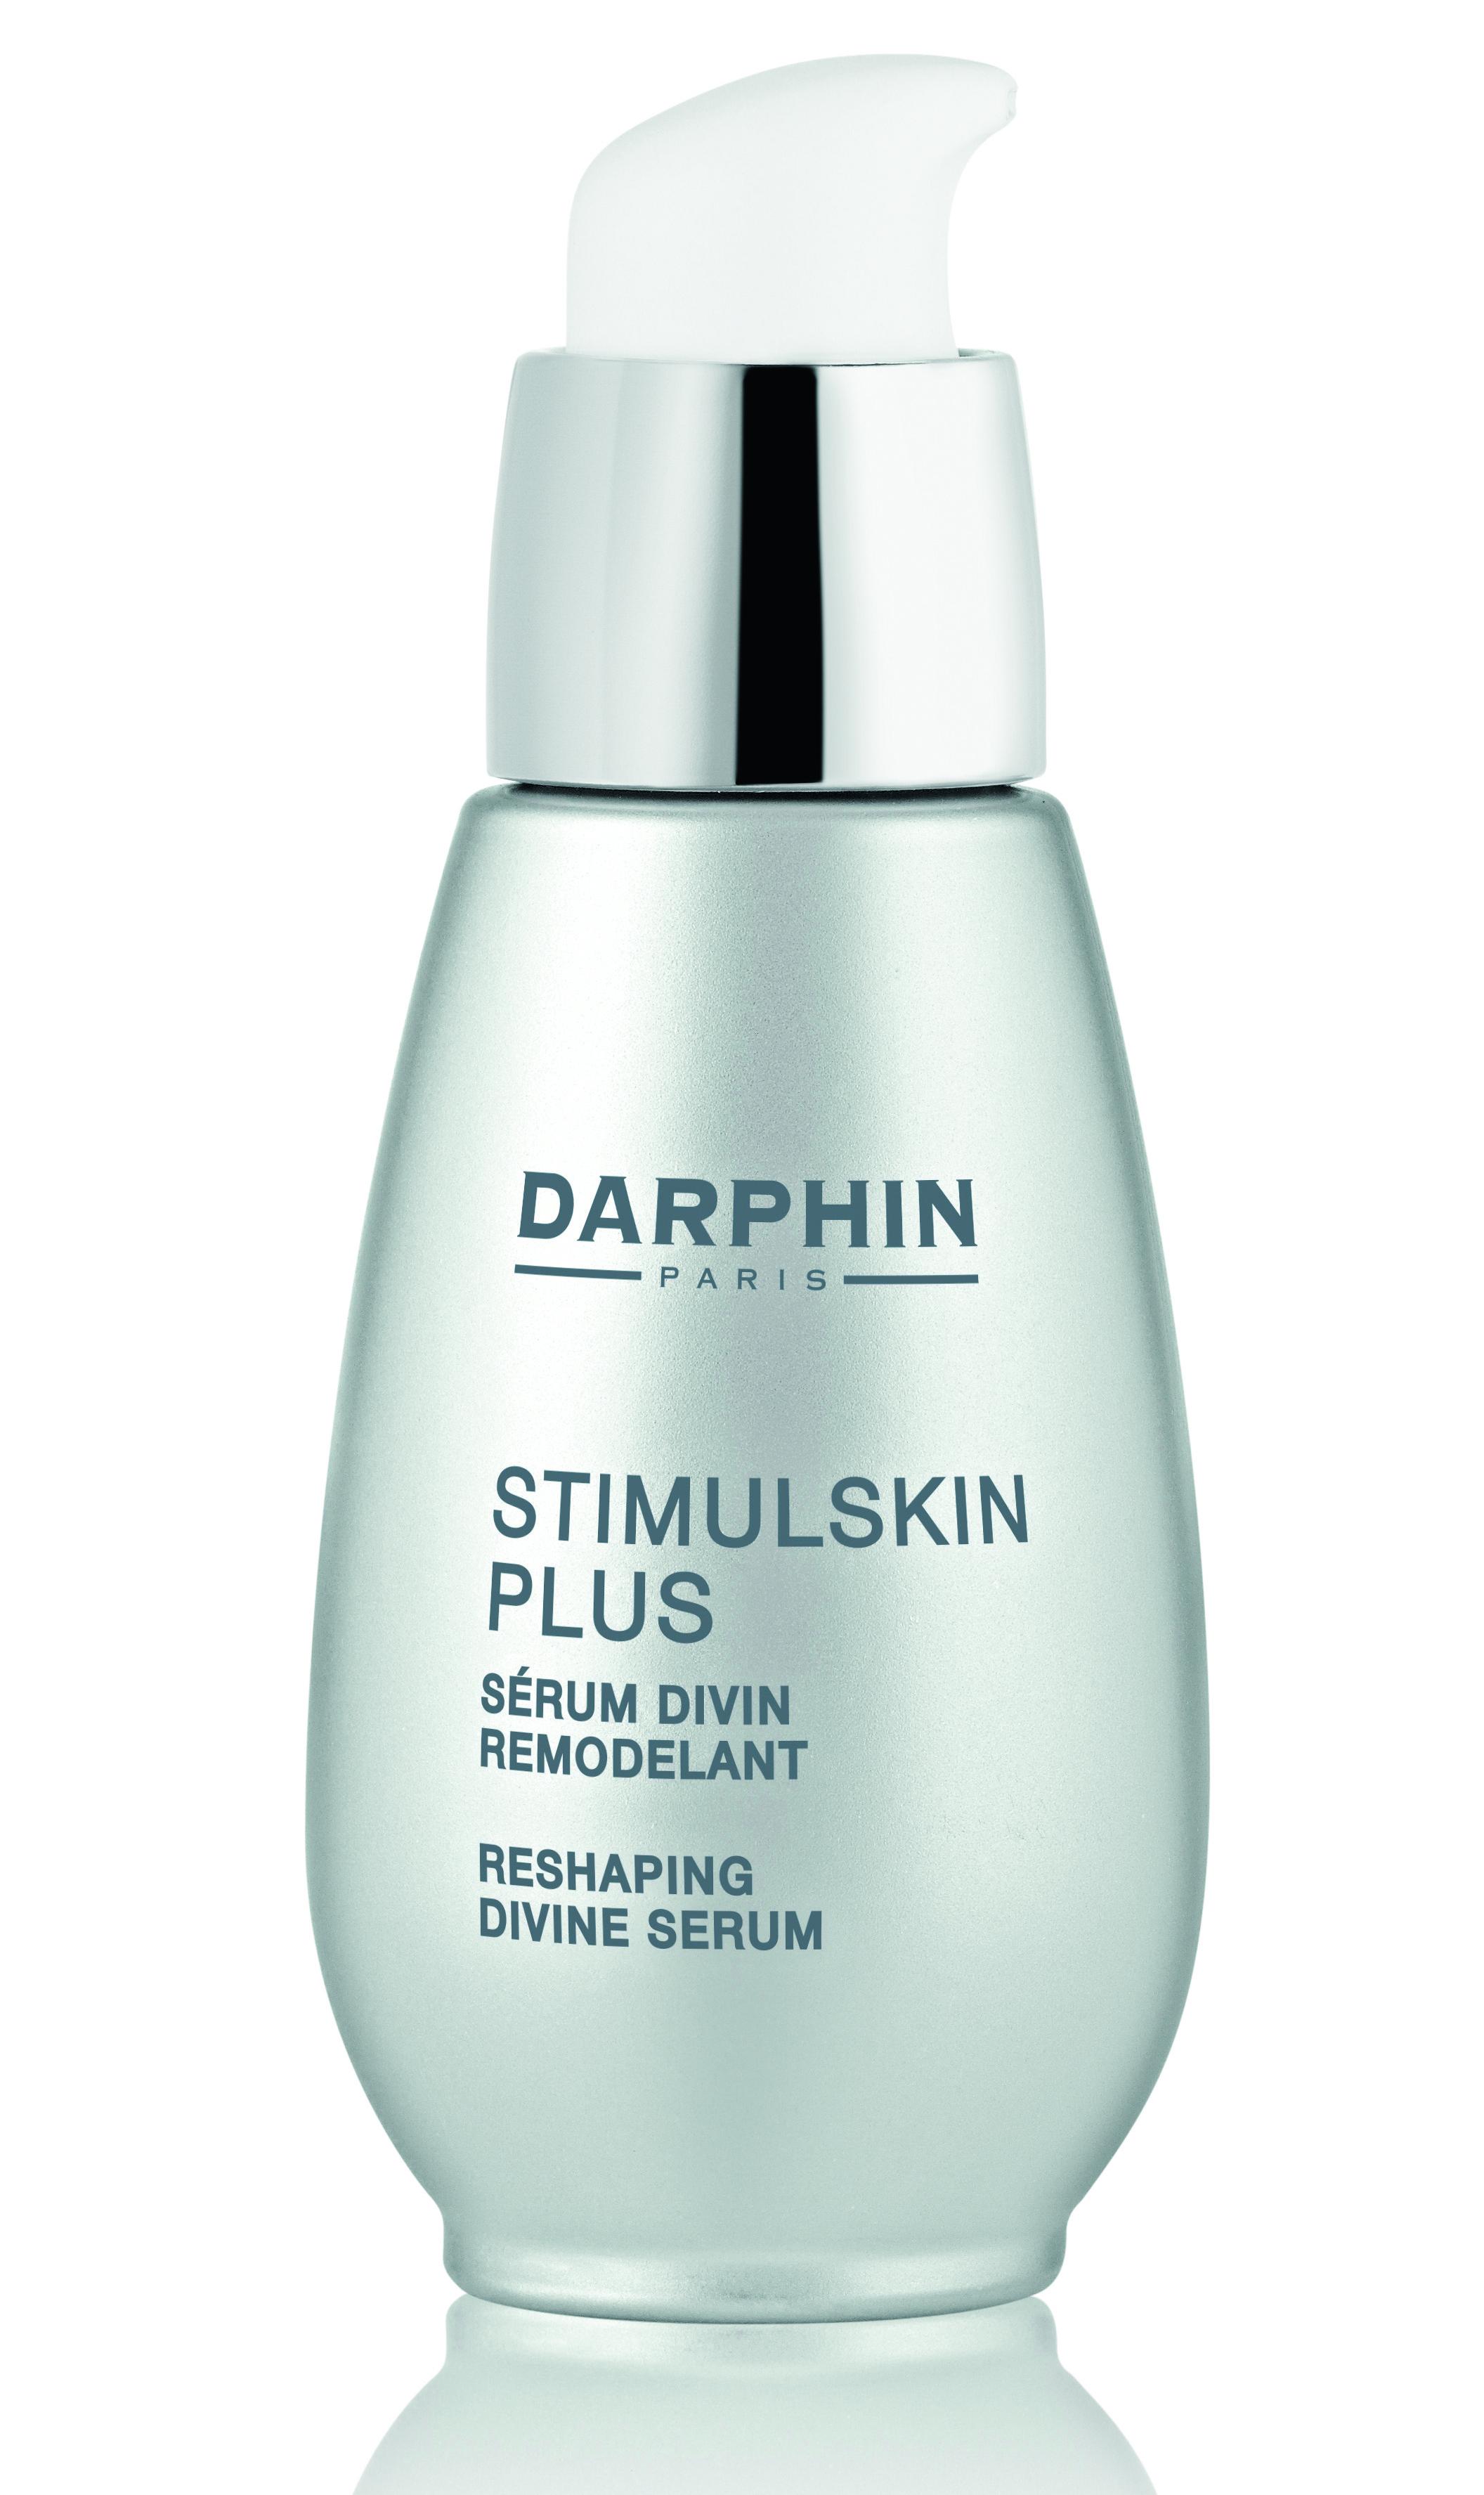 Darphin Stimulskin Plus Total Anti Aging & Reshaping Divine Serum All Skin Types ομορφιά   αντιγήρανση και σύσφιξη προσώπου   serum σύσφιξης